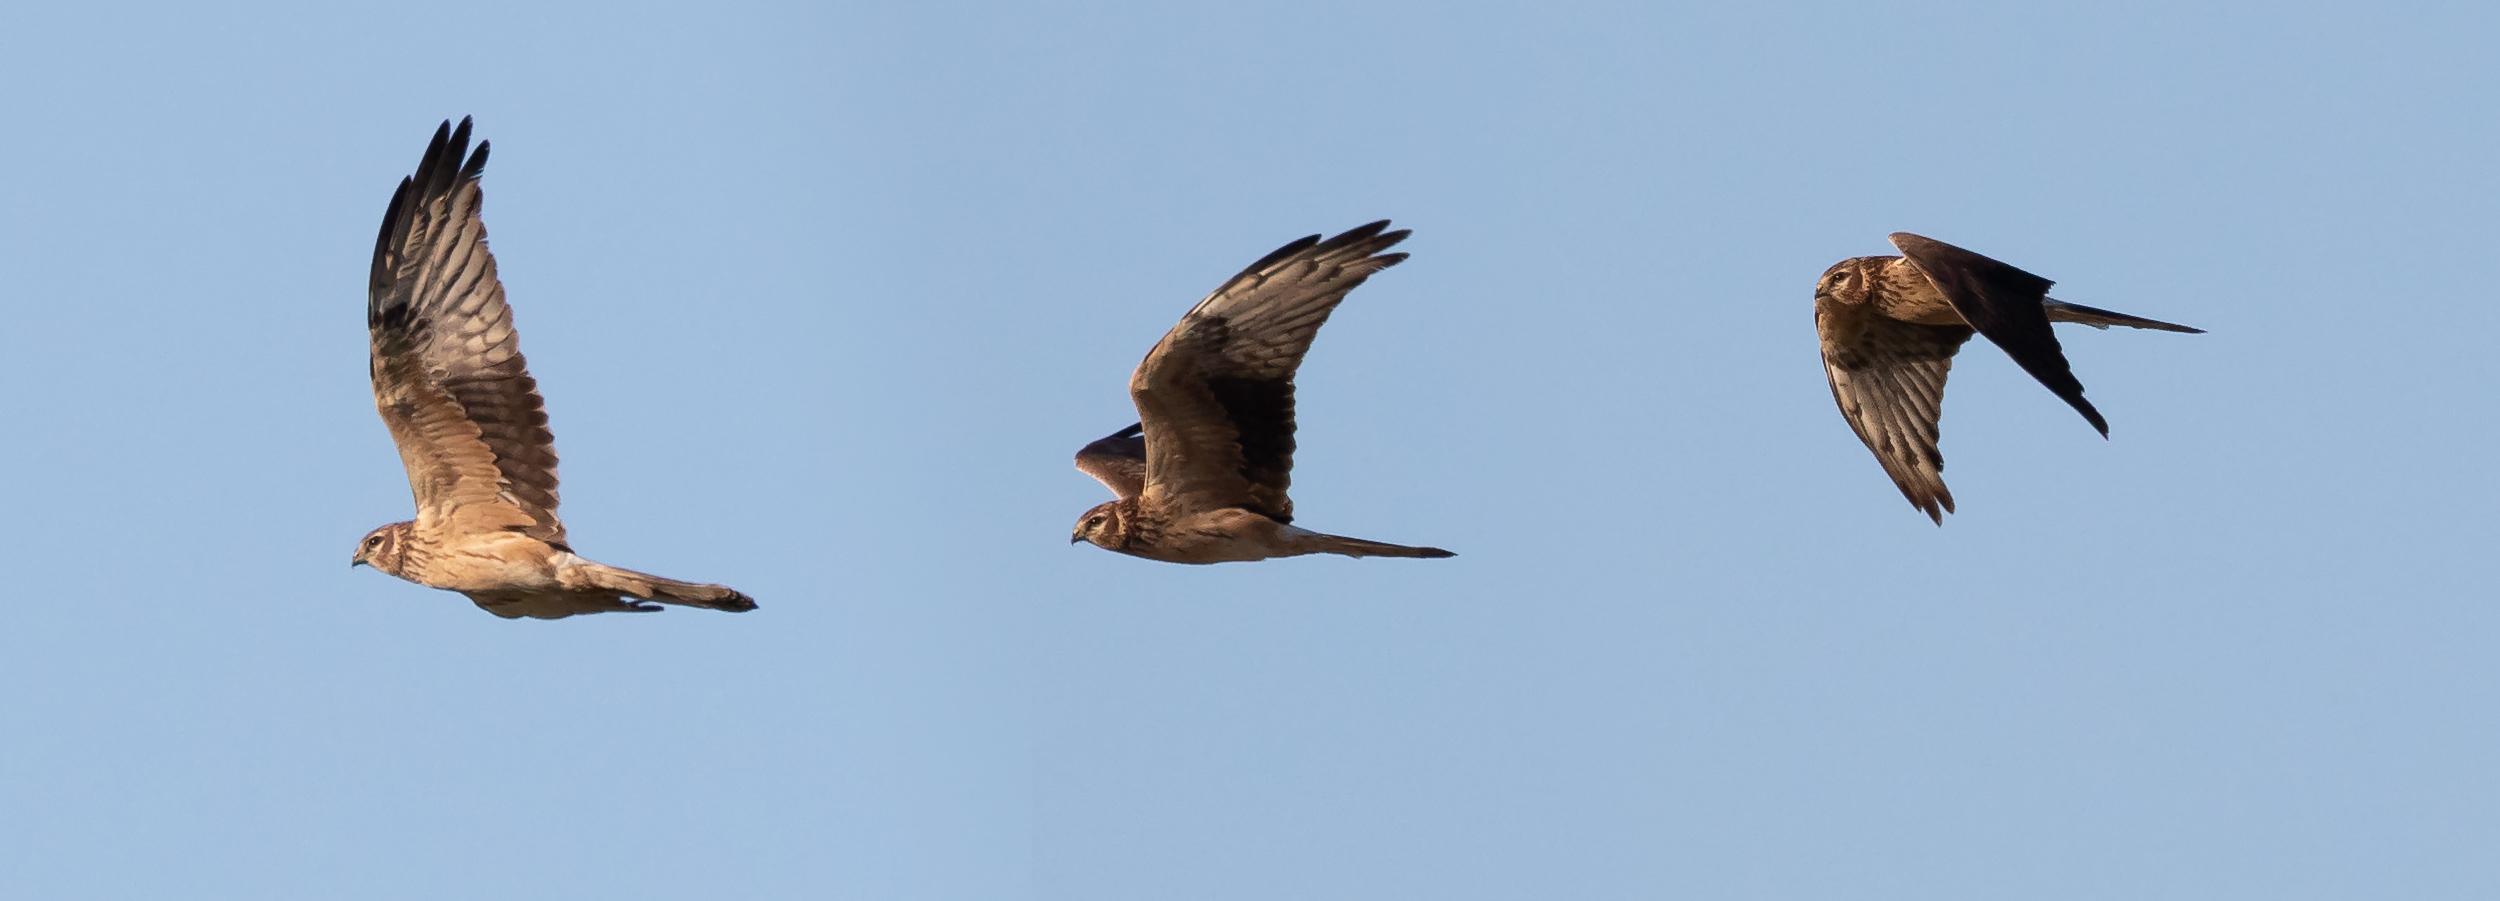 2CY Female Montagu's Harrier (photo compilation).